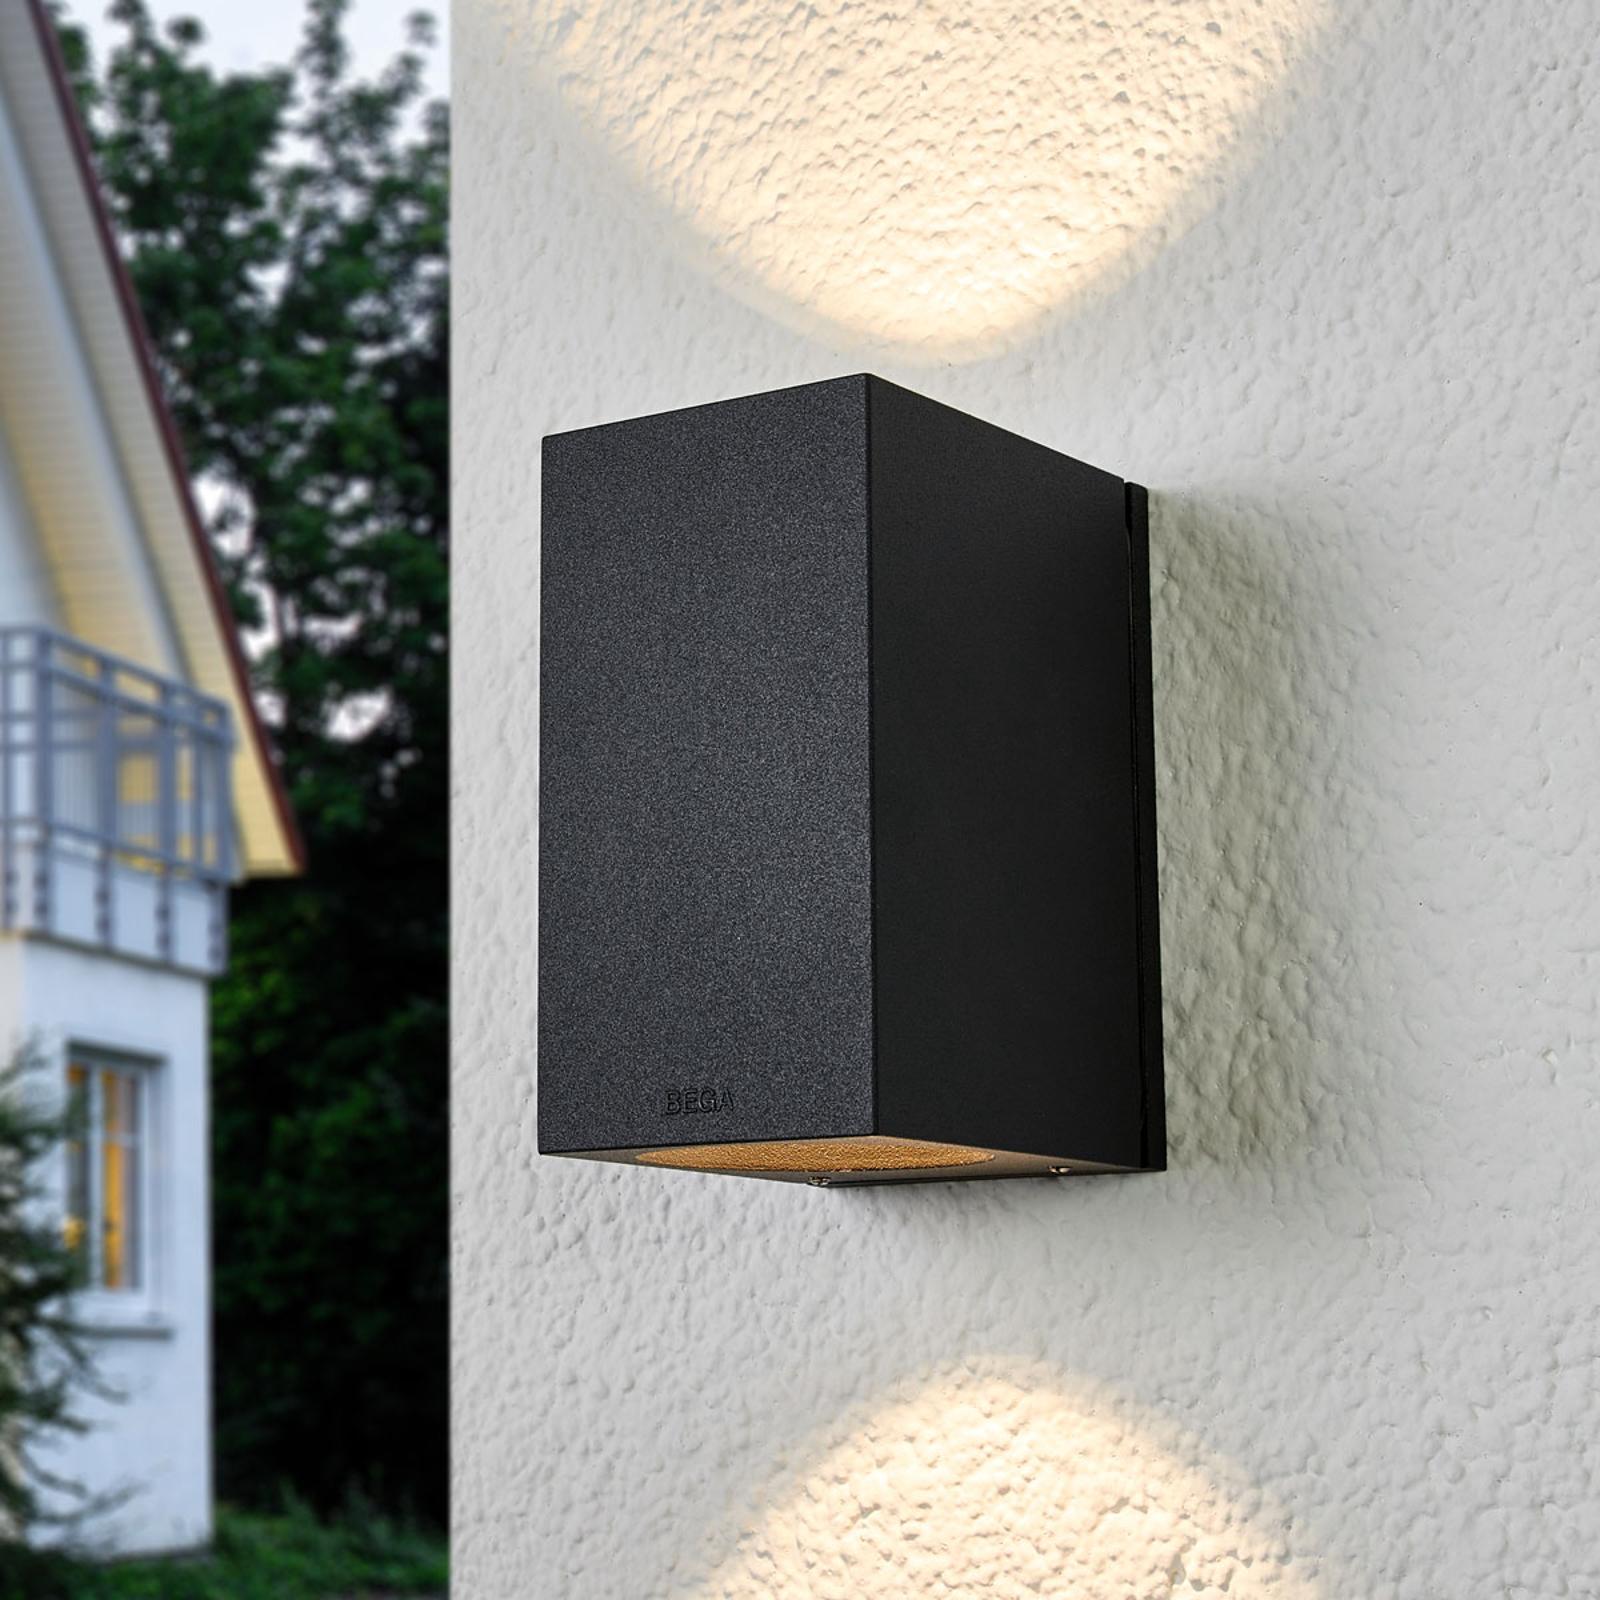 BEGA 33590K3 wall lamp graphite 3,000 K up/down_1566023_1